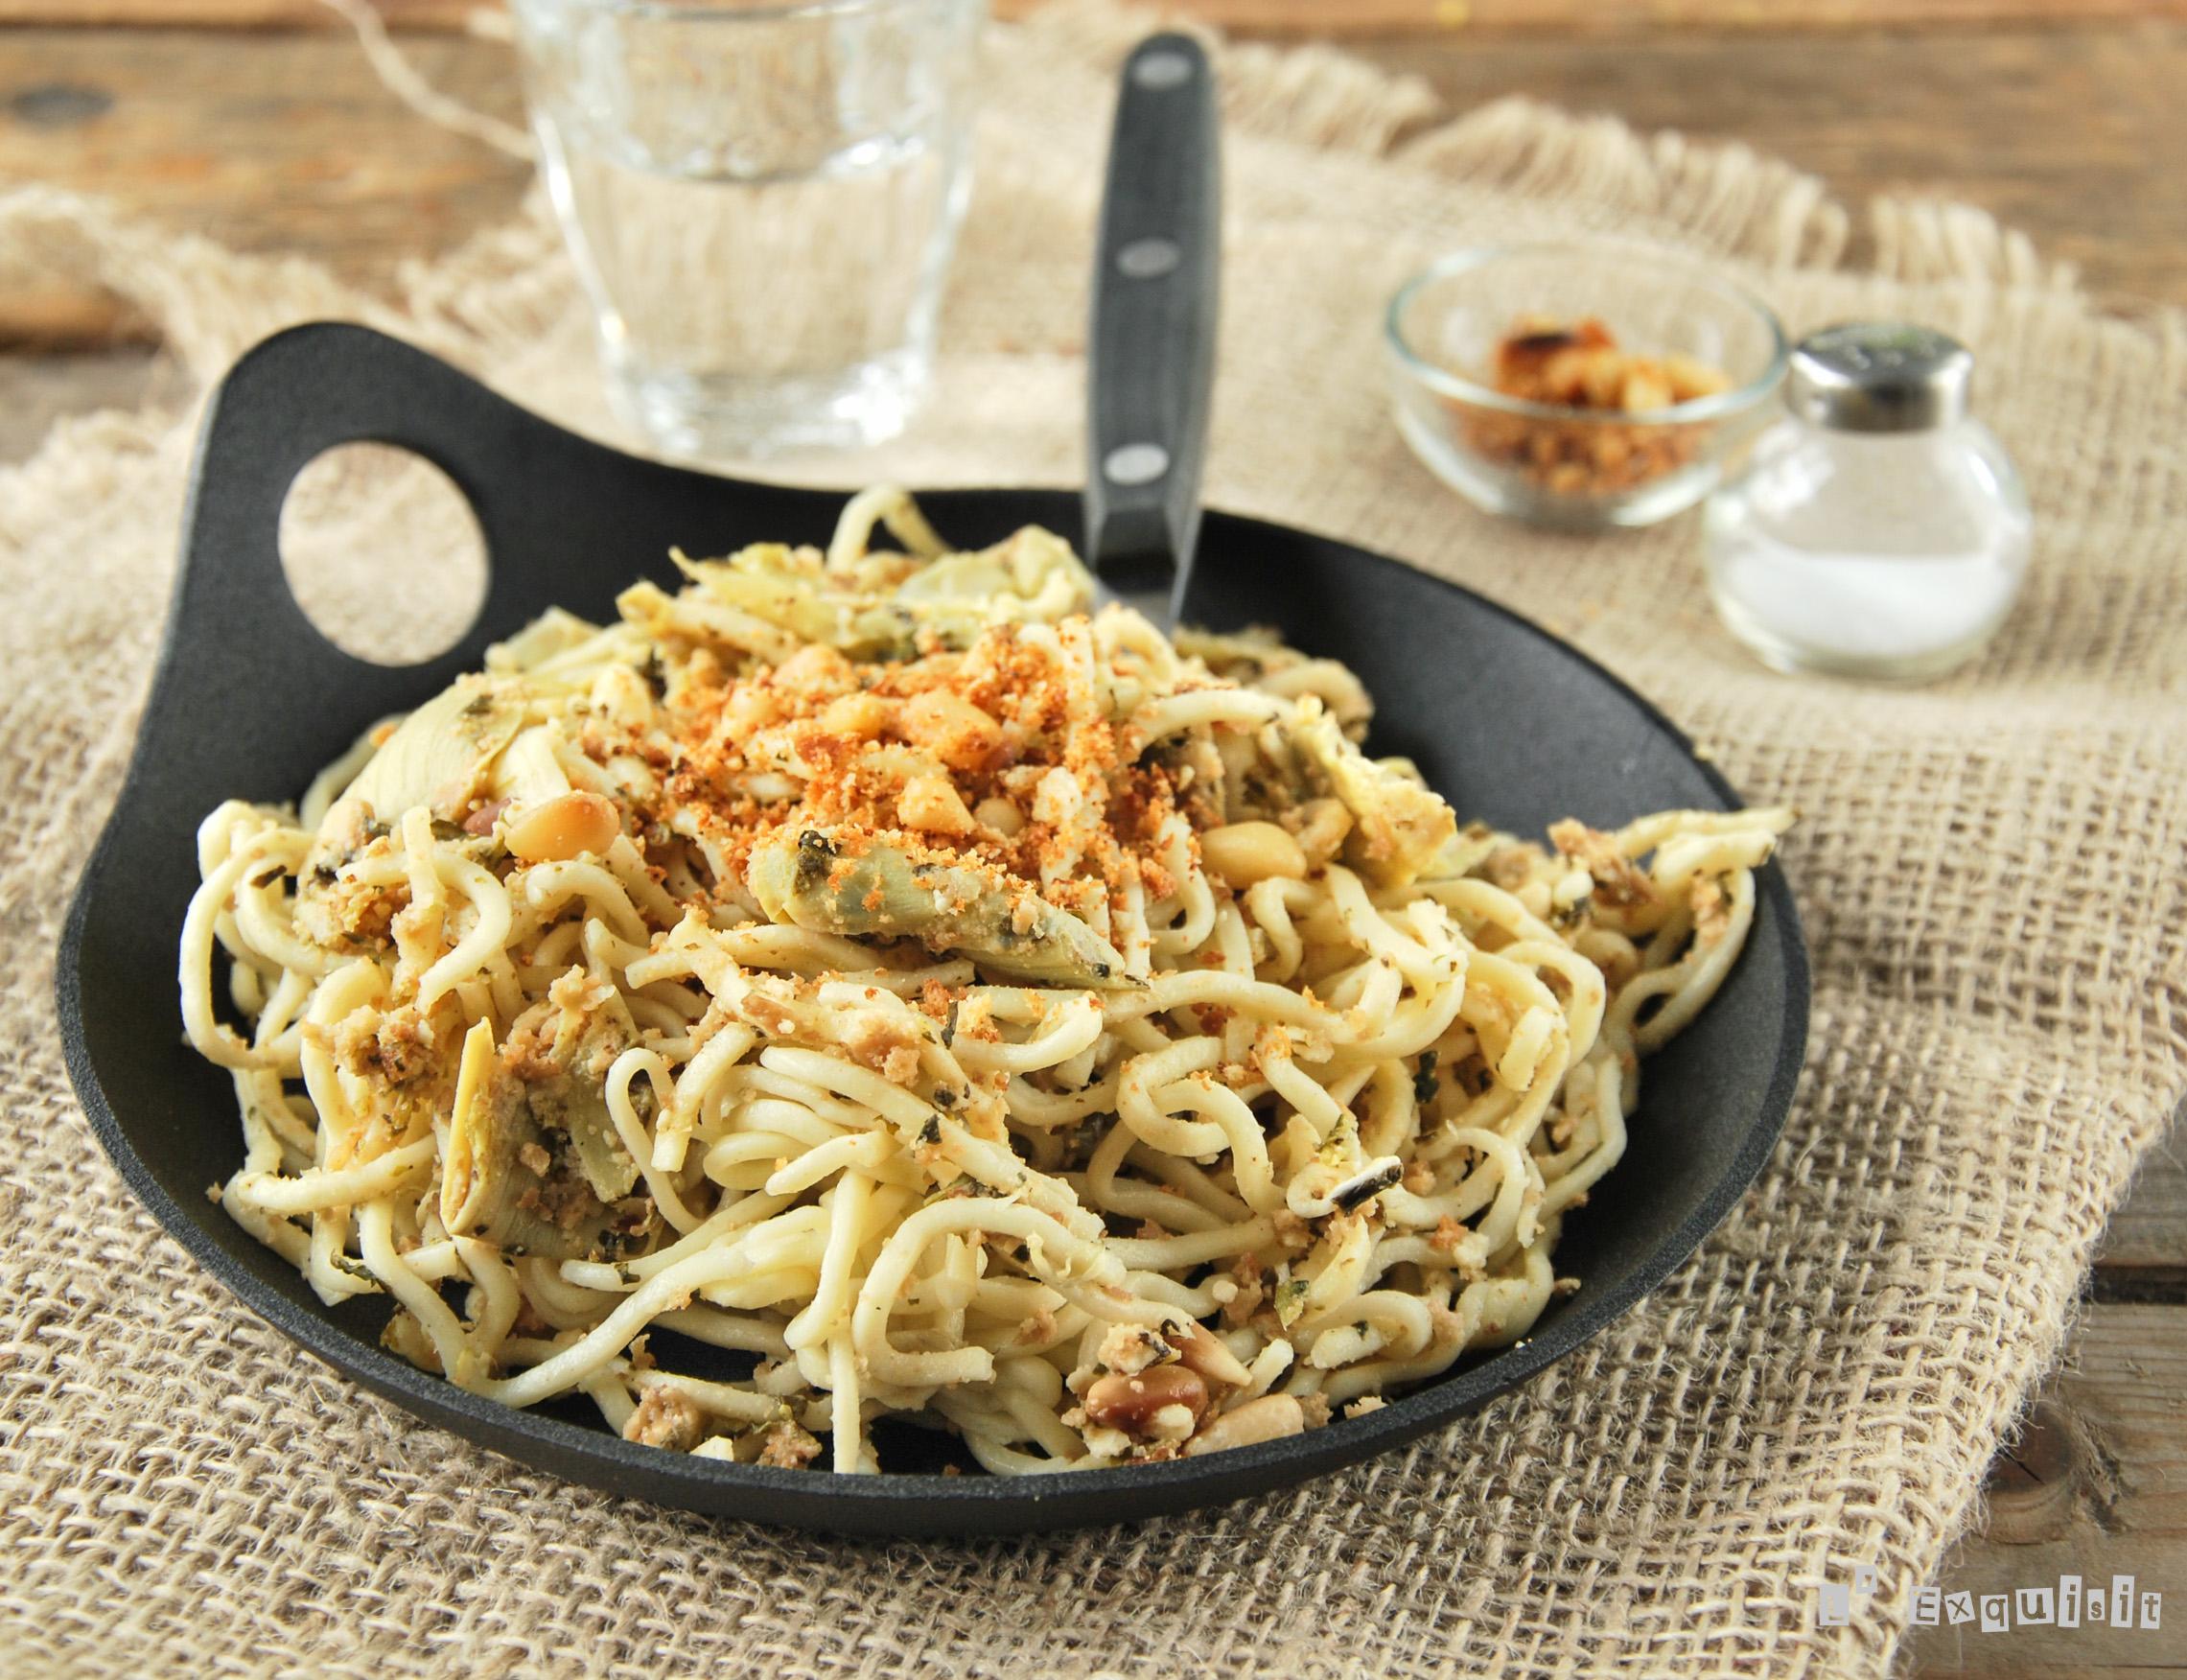 Spaguettis con alcachofas, espinacas y pangrattato